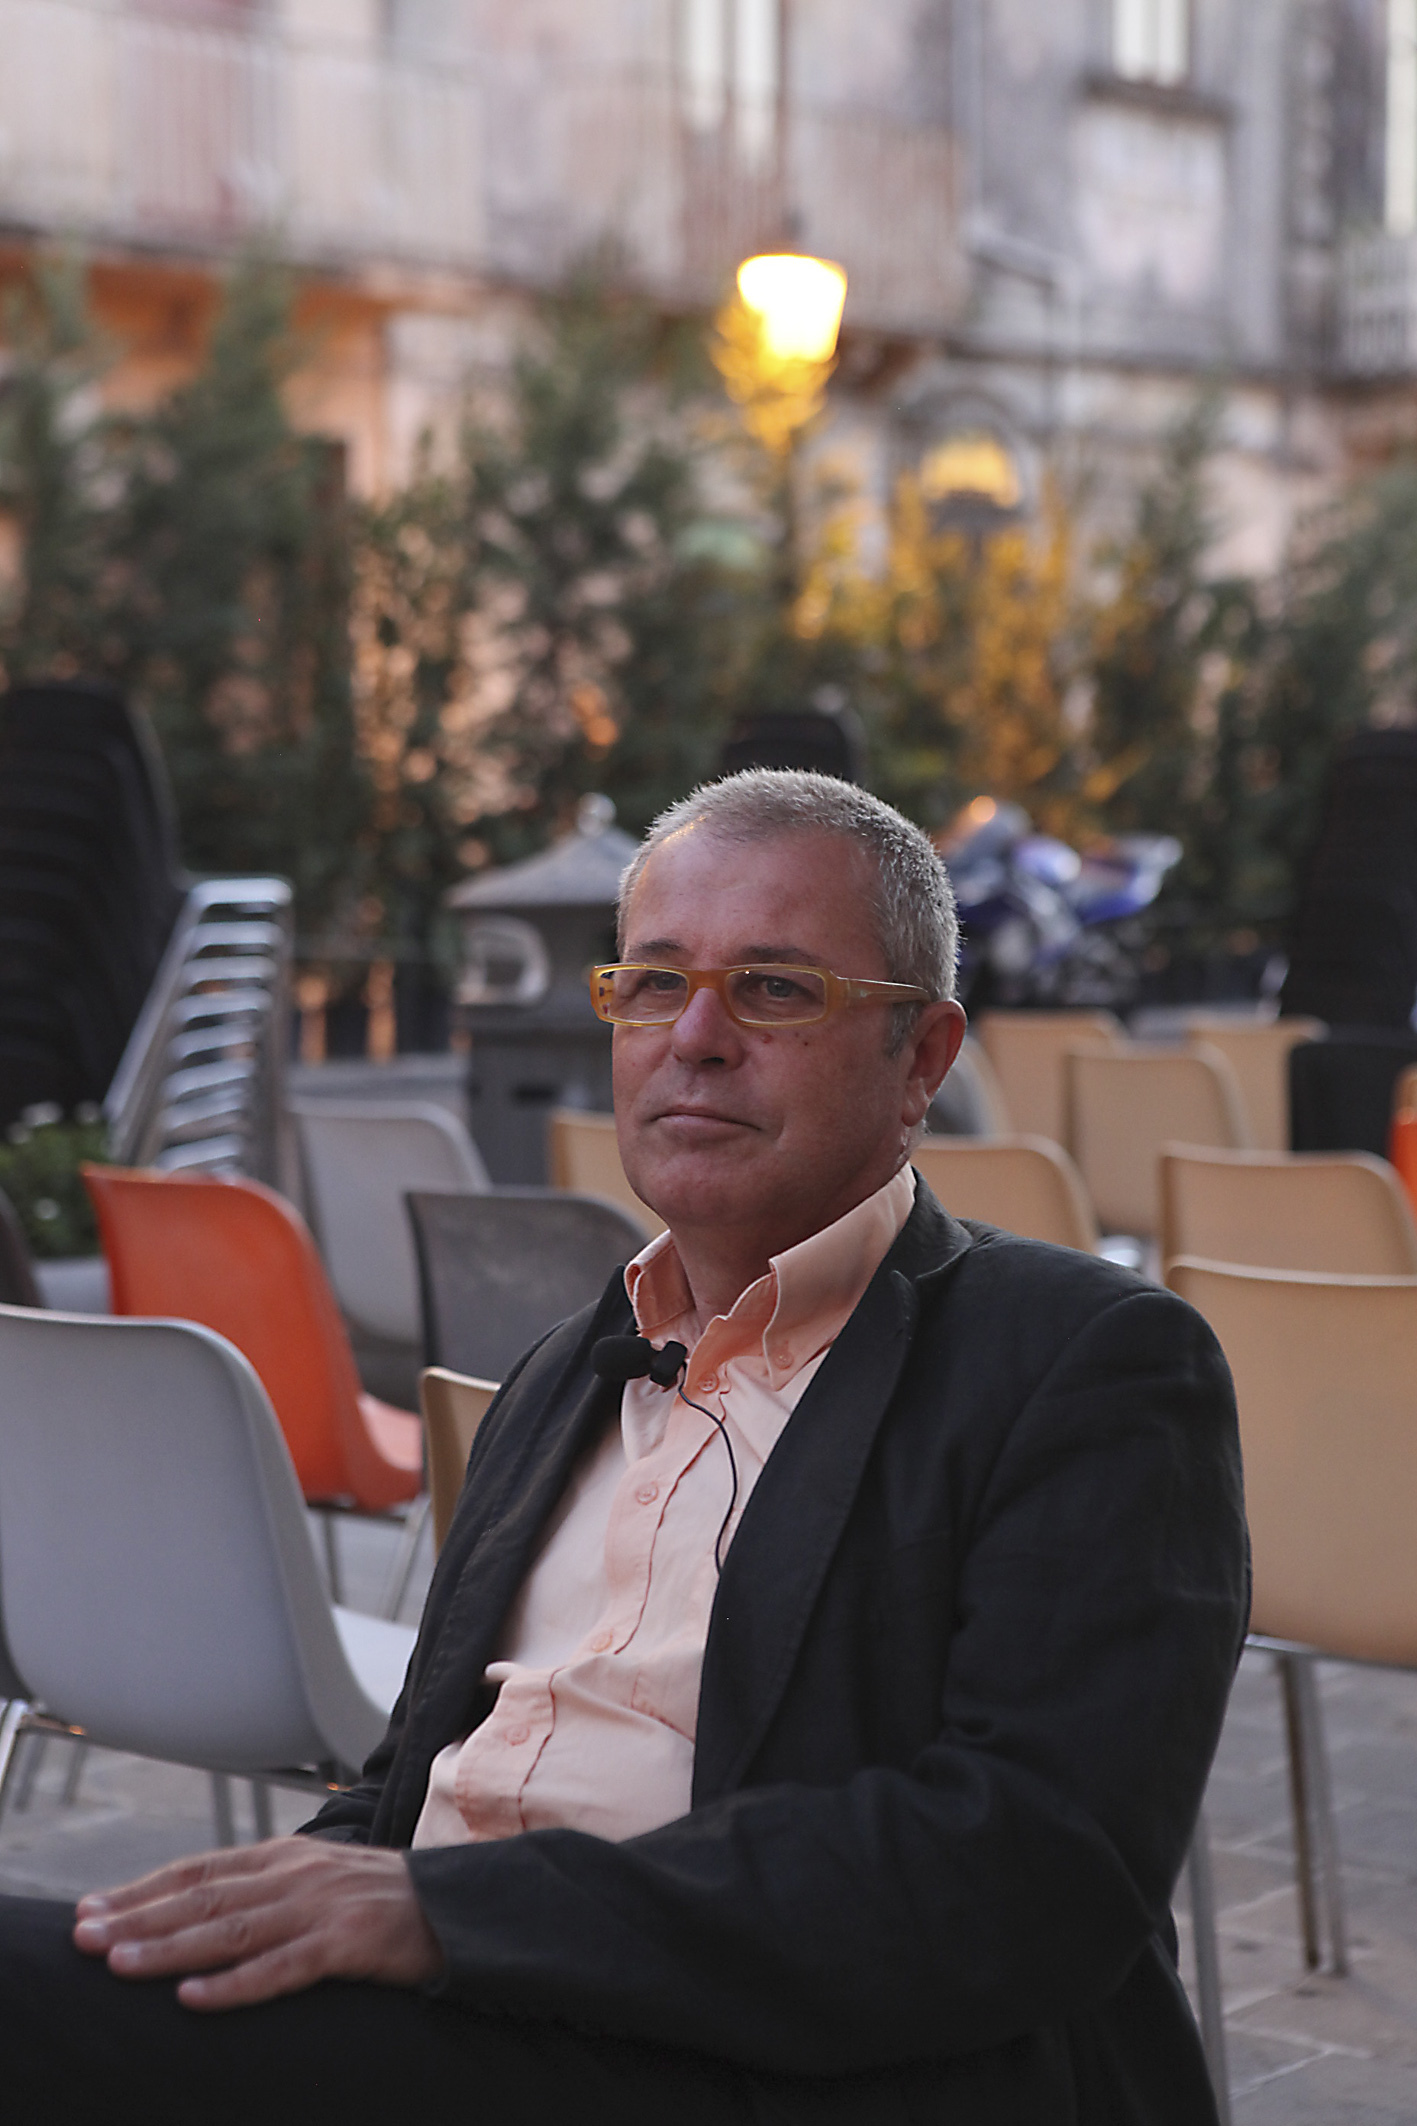 Maurizio Franco